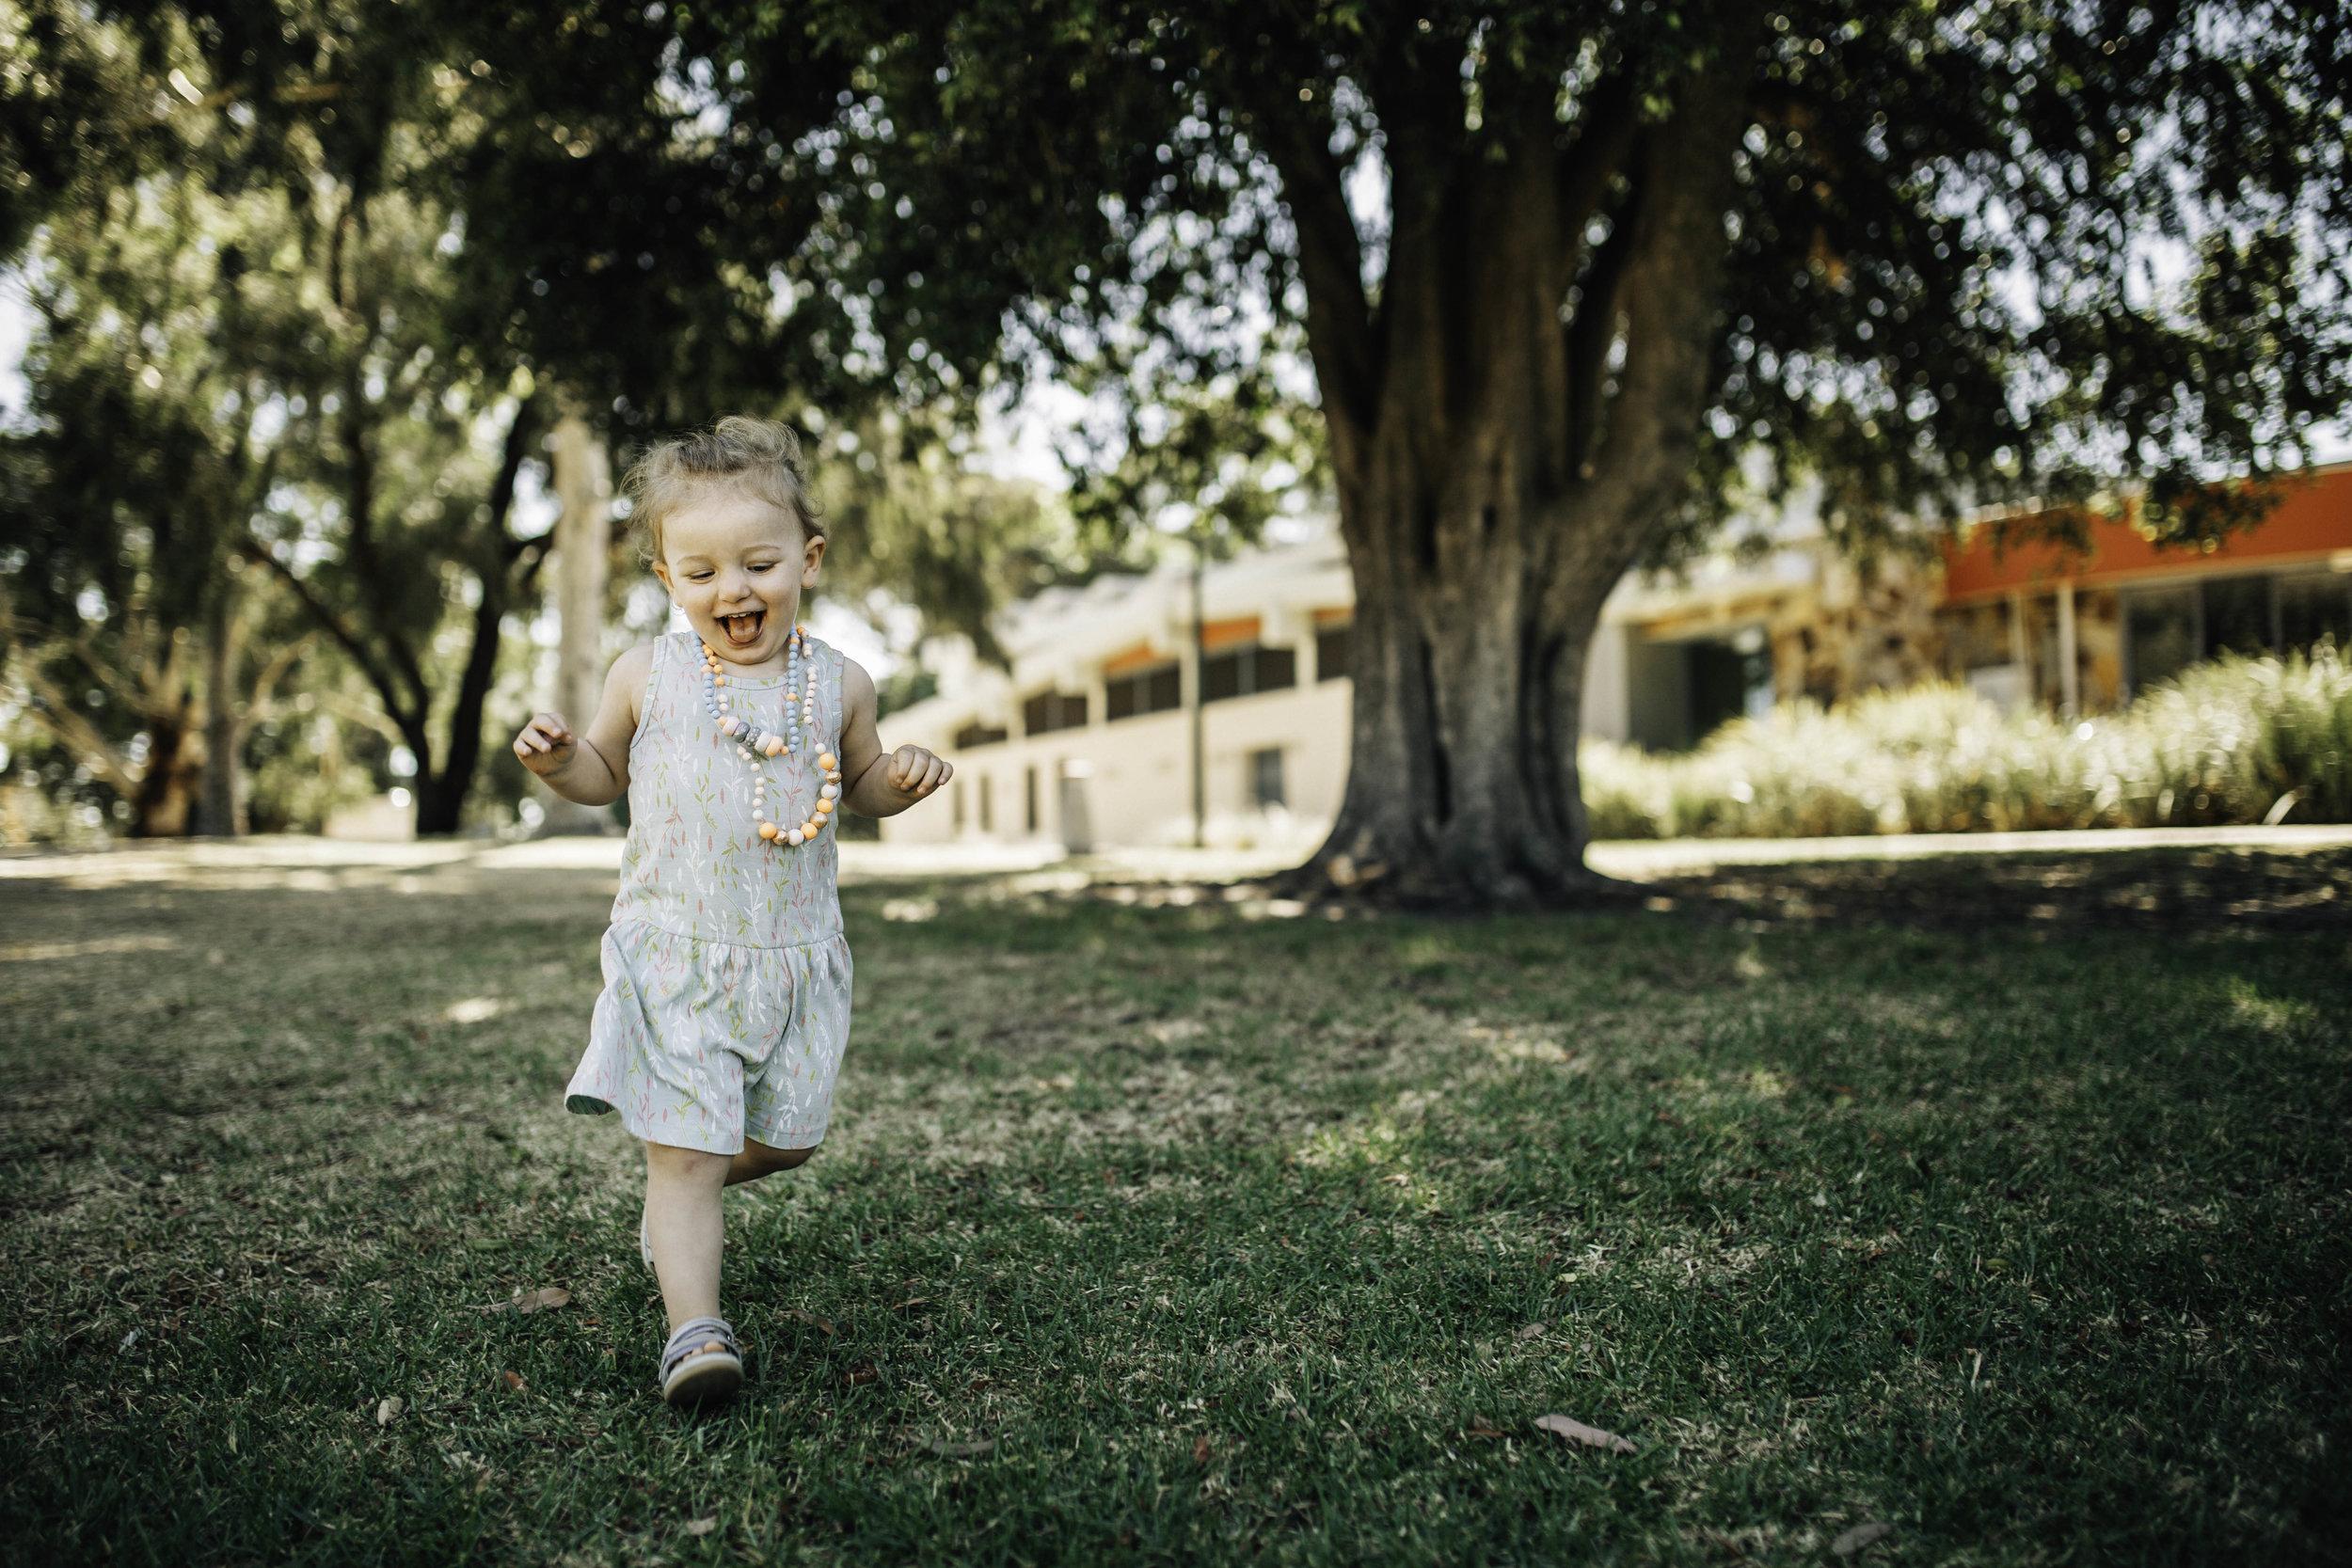 little-girl-in-green-frock-running-over-grass.jpg